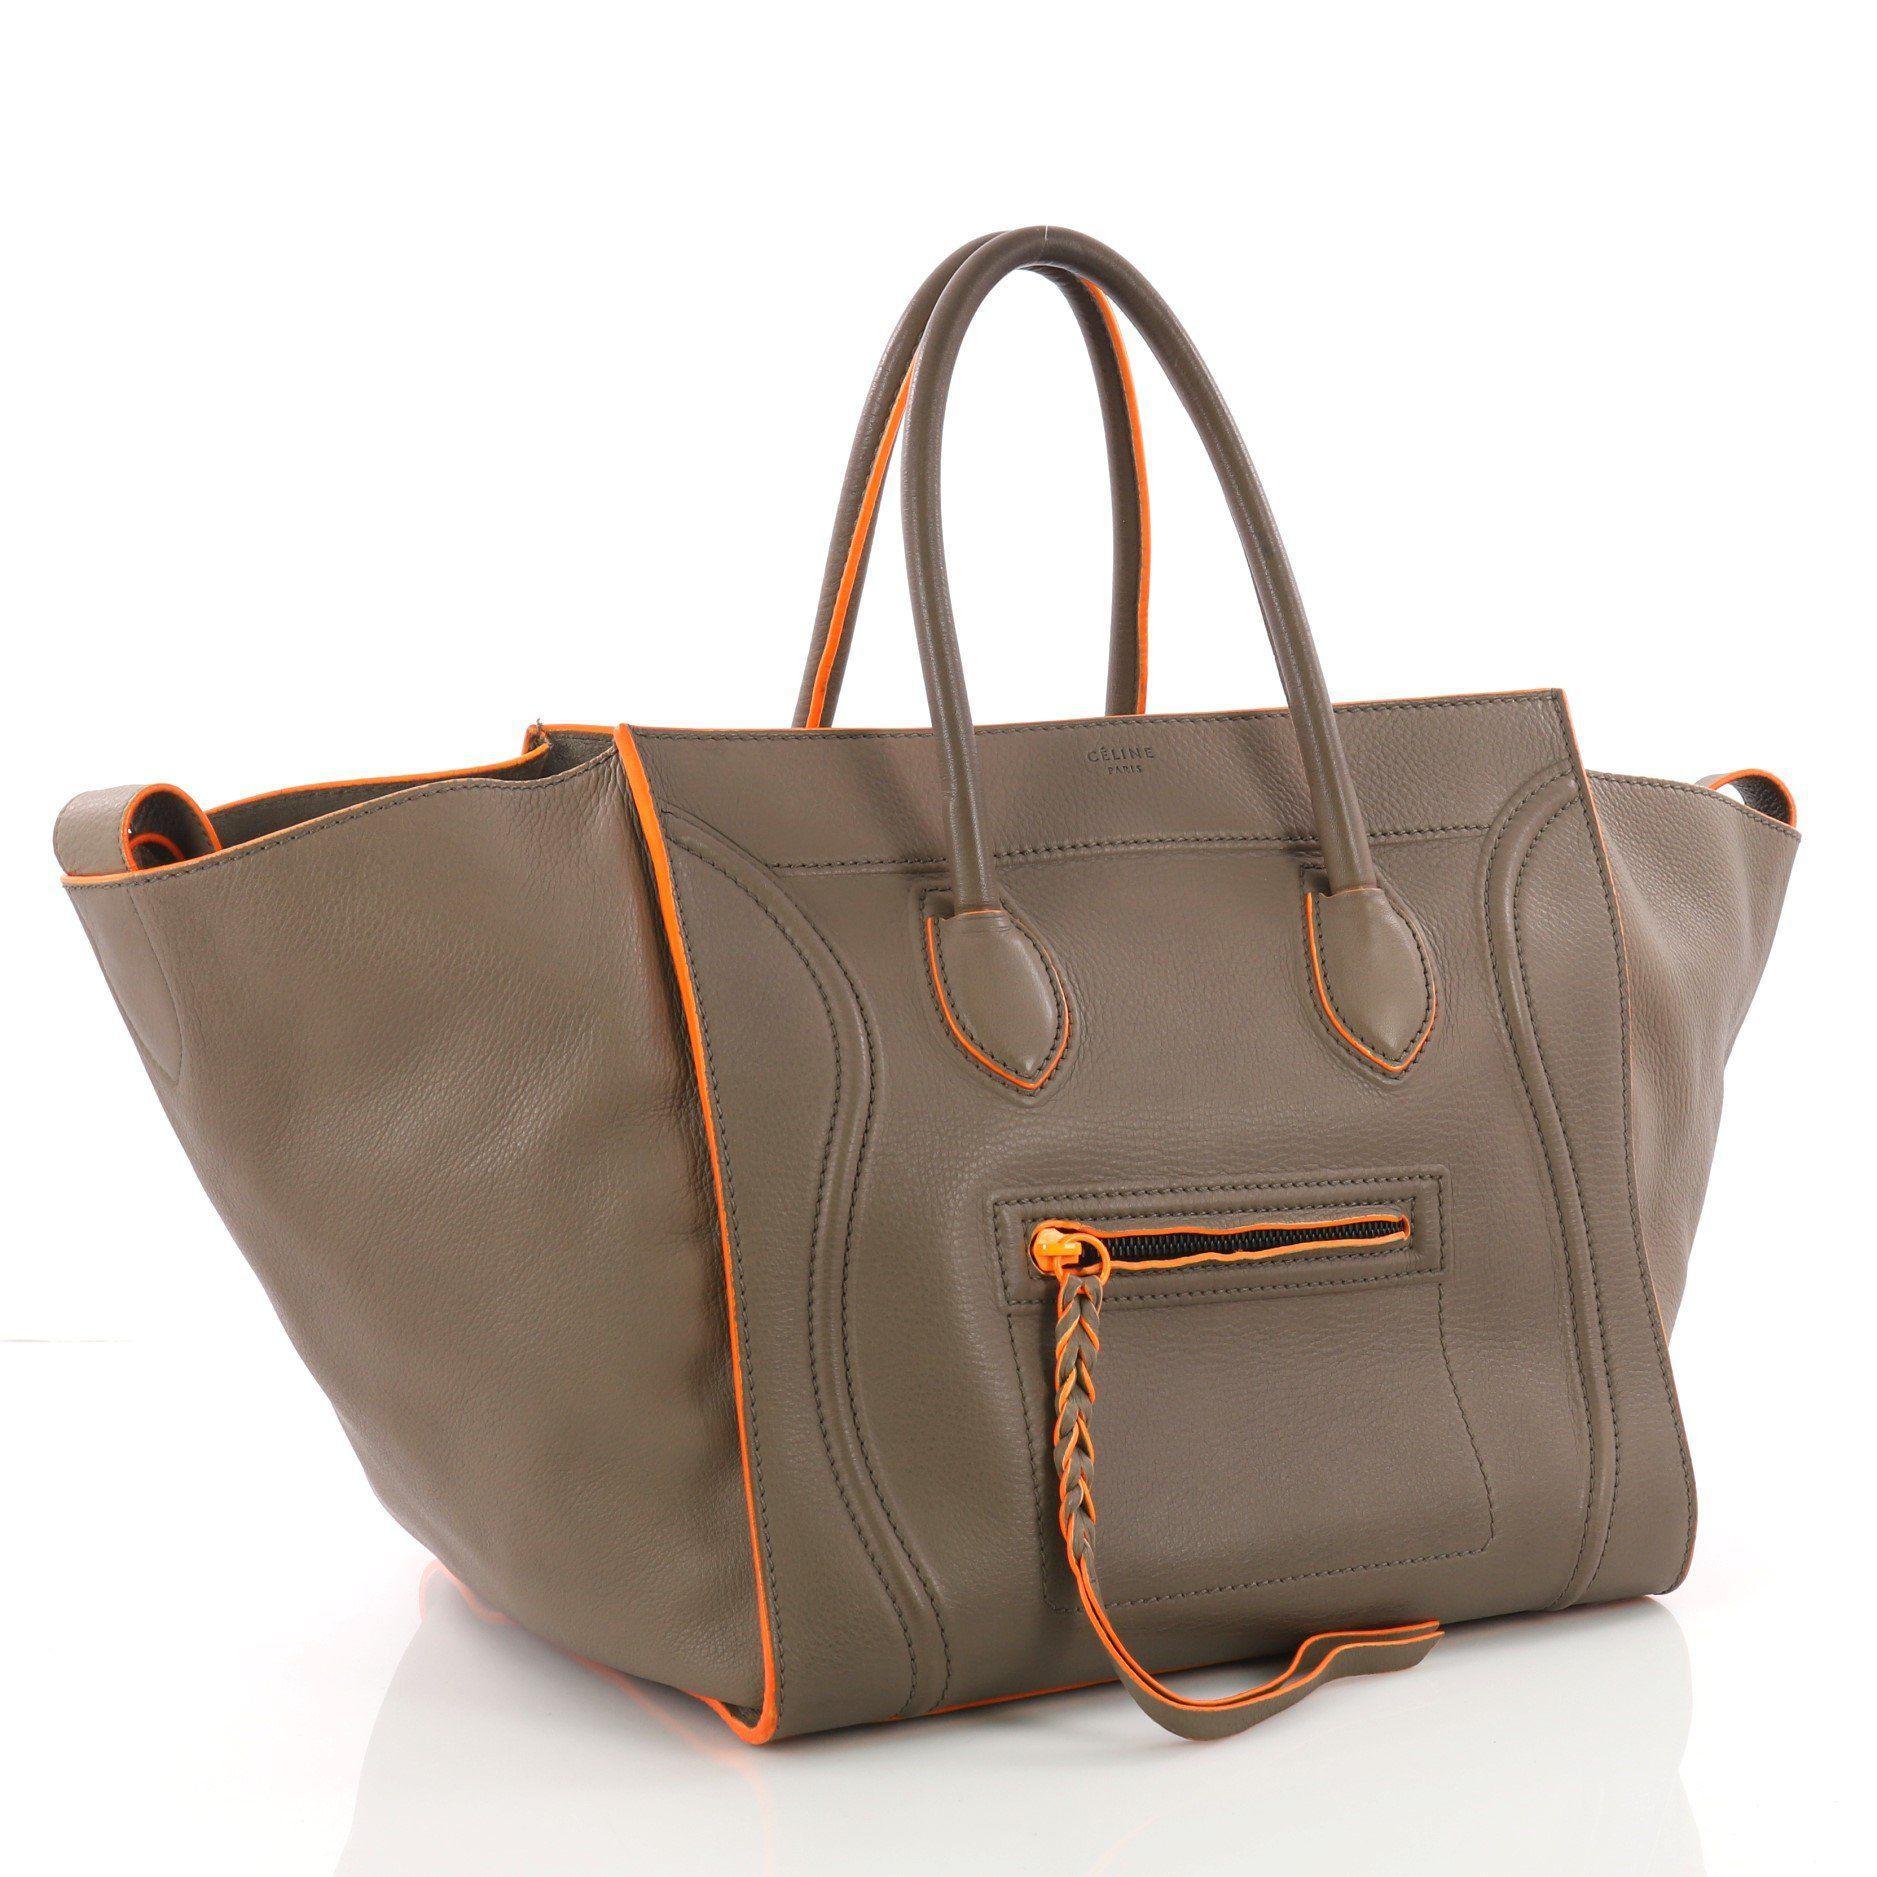 9a9e078187 Céline - Brown Pre Owned Phantom Handbag Grainy Leather Medium - Lyst. View  fullscreen